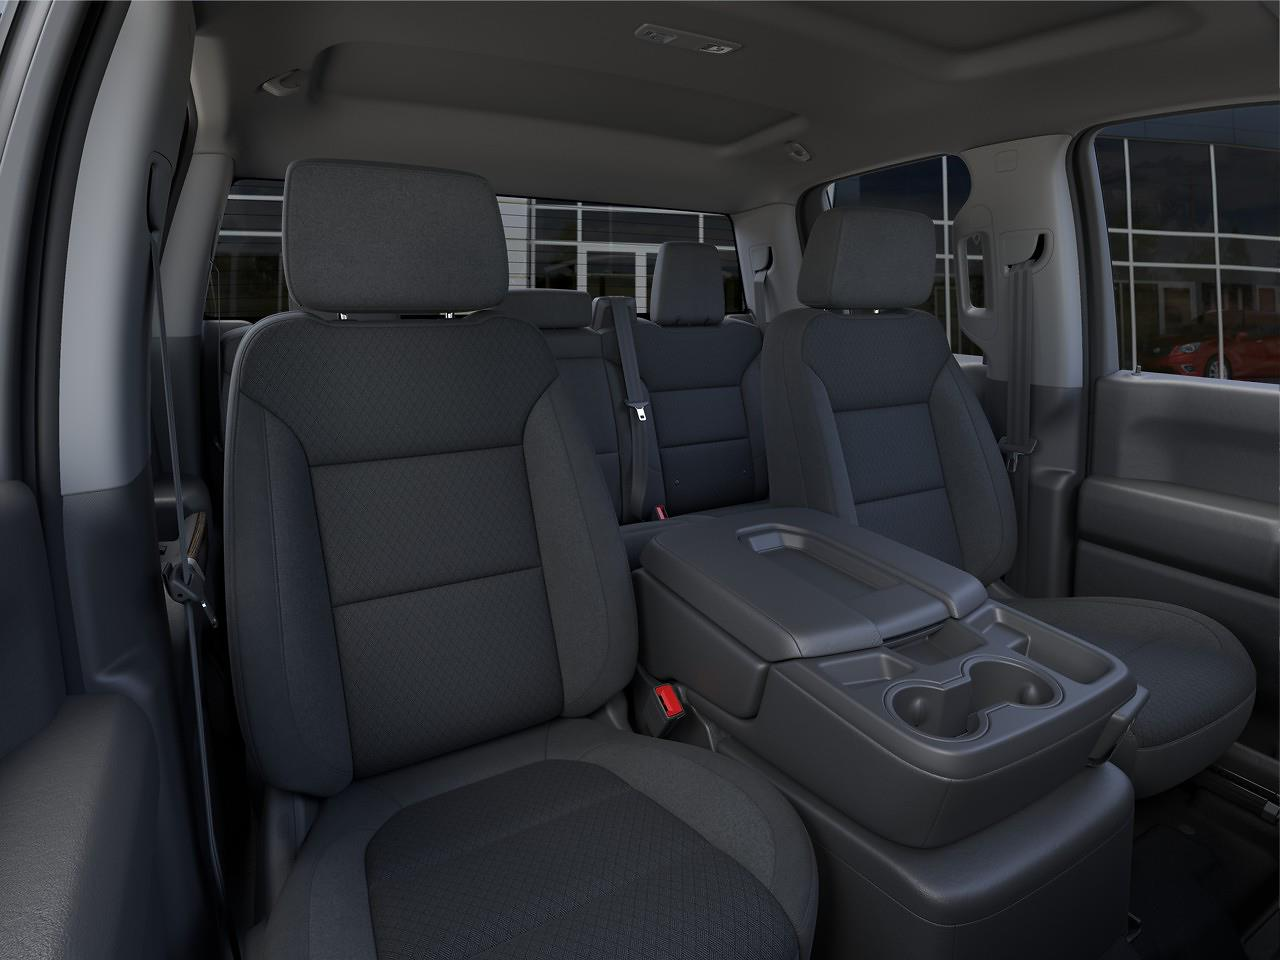 2021 GMC Sierra 1500 Double Cab 4x4, Pickup #416068 - photo 13